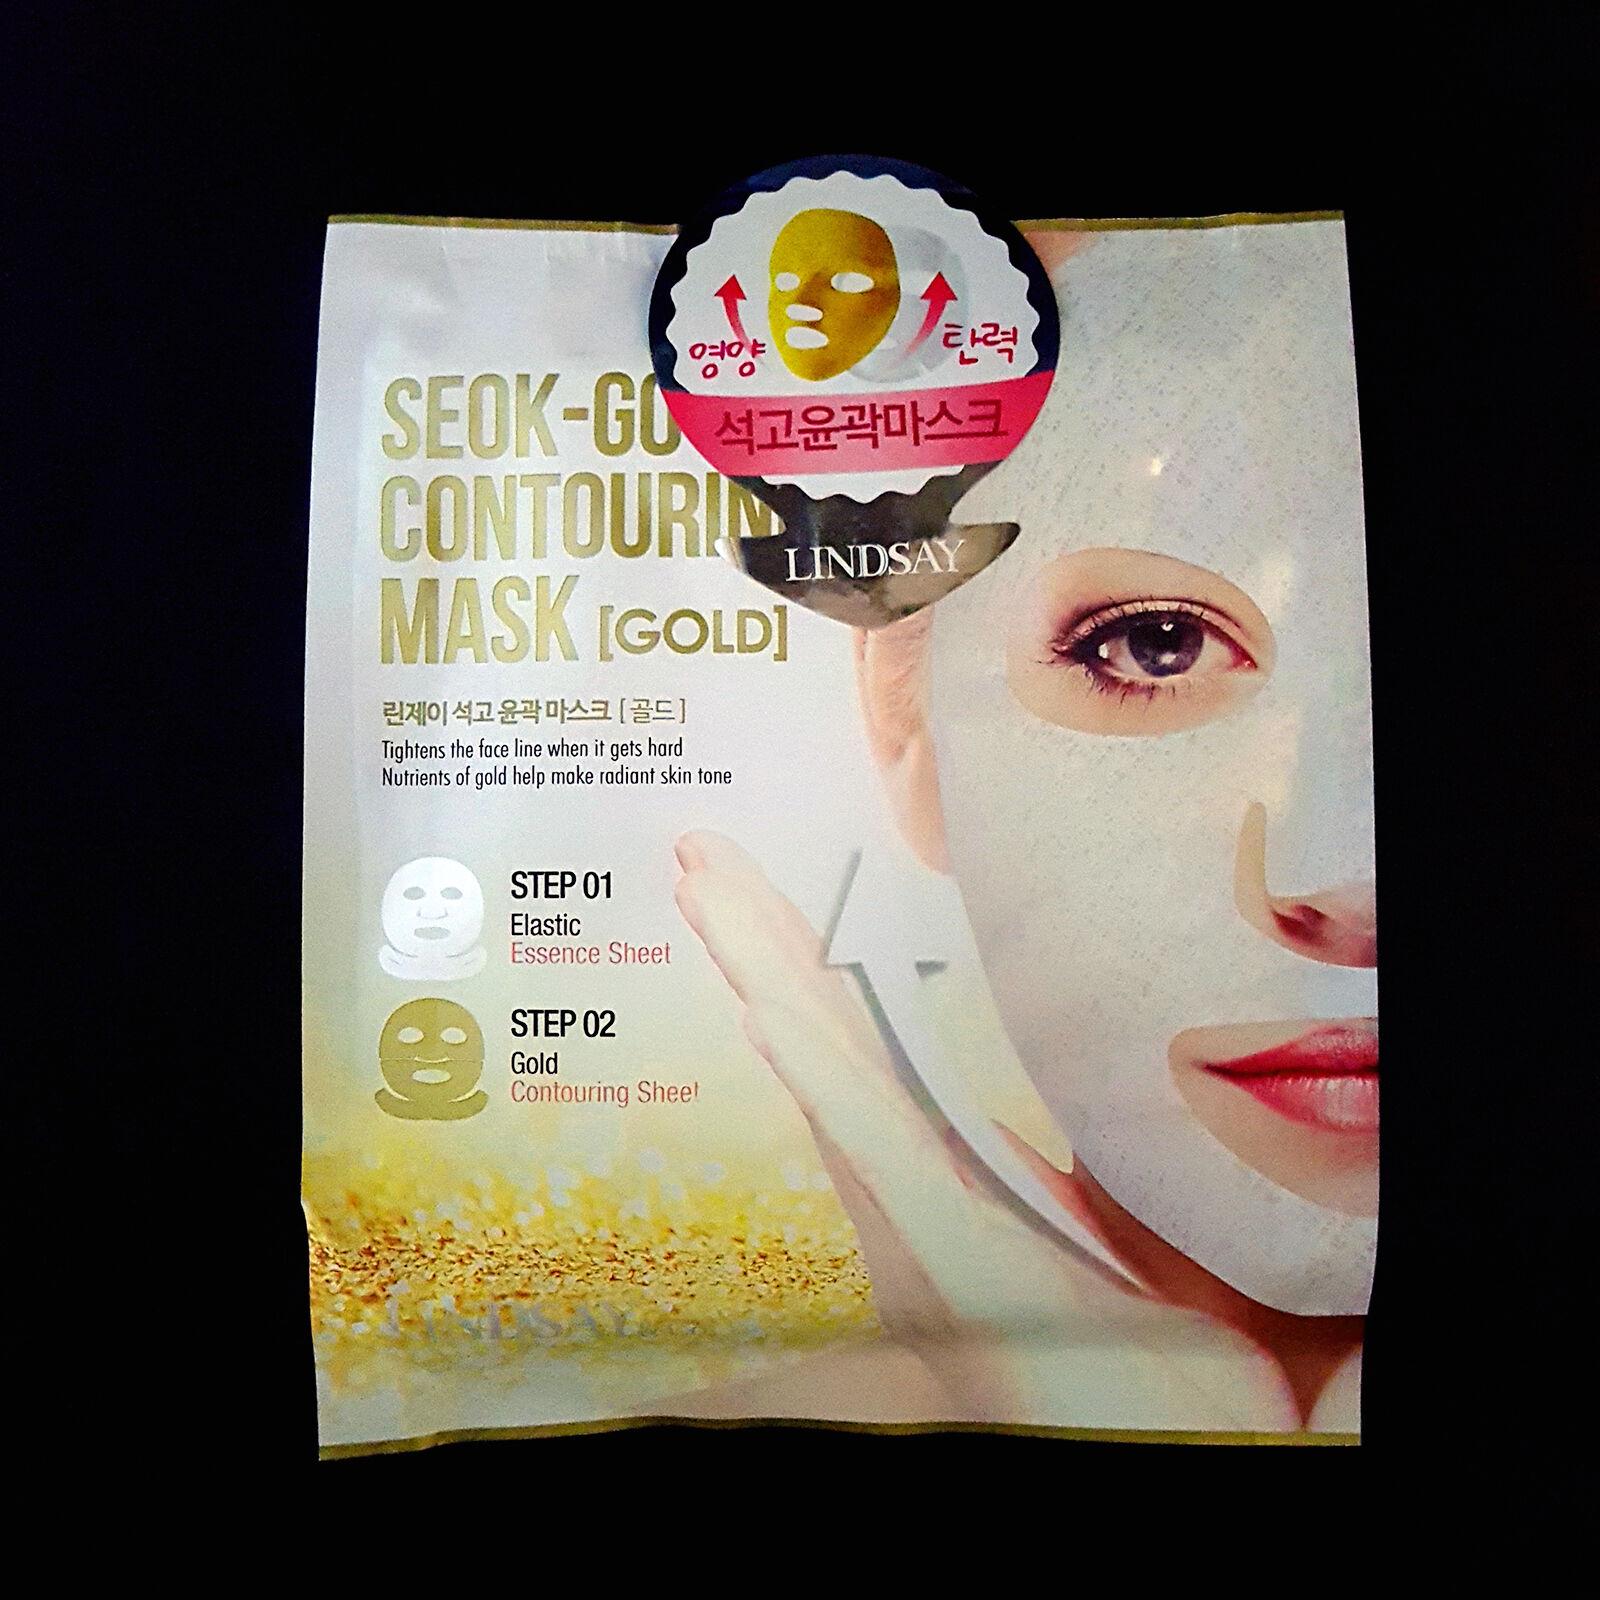 Lindsay Seok Go Contouring Mask Gold Elastic Radiant Facial Etude House 02 Air Therapy 3 Pcs Sheet Skincare Item Number 292058066989